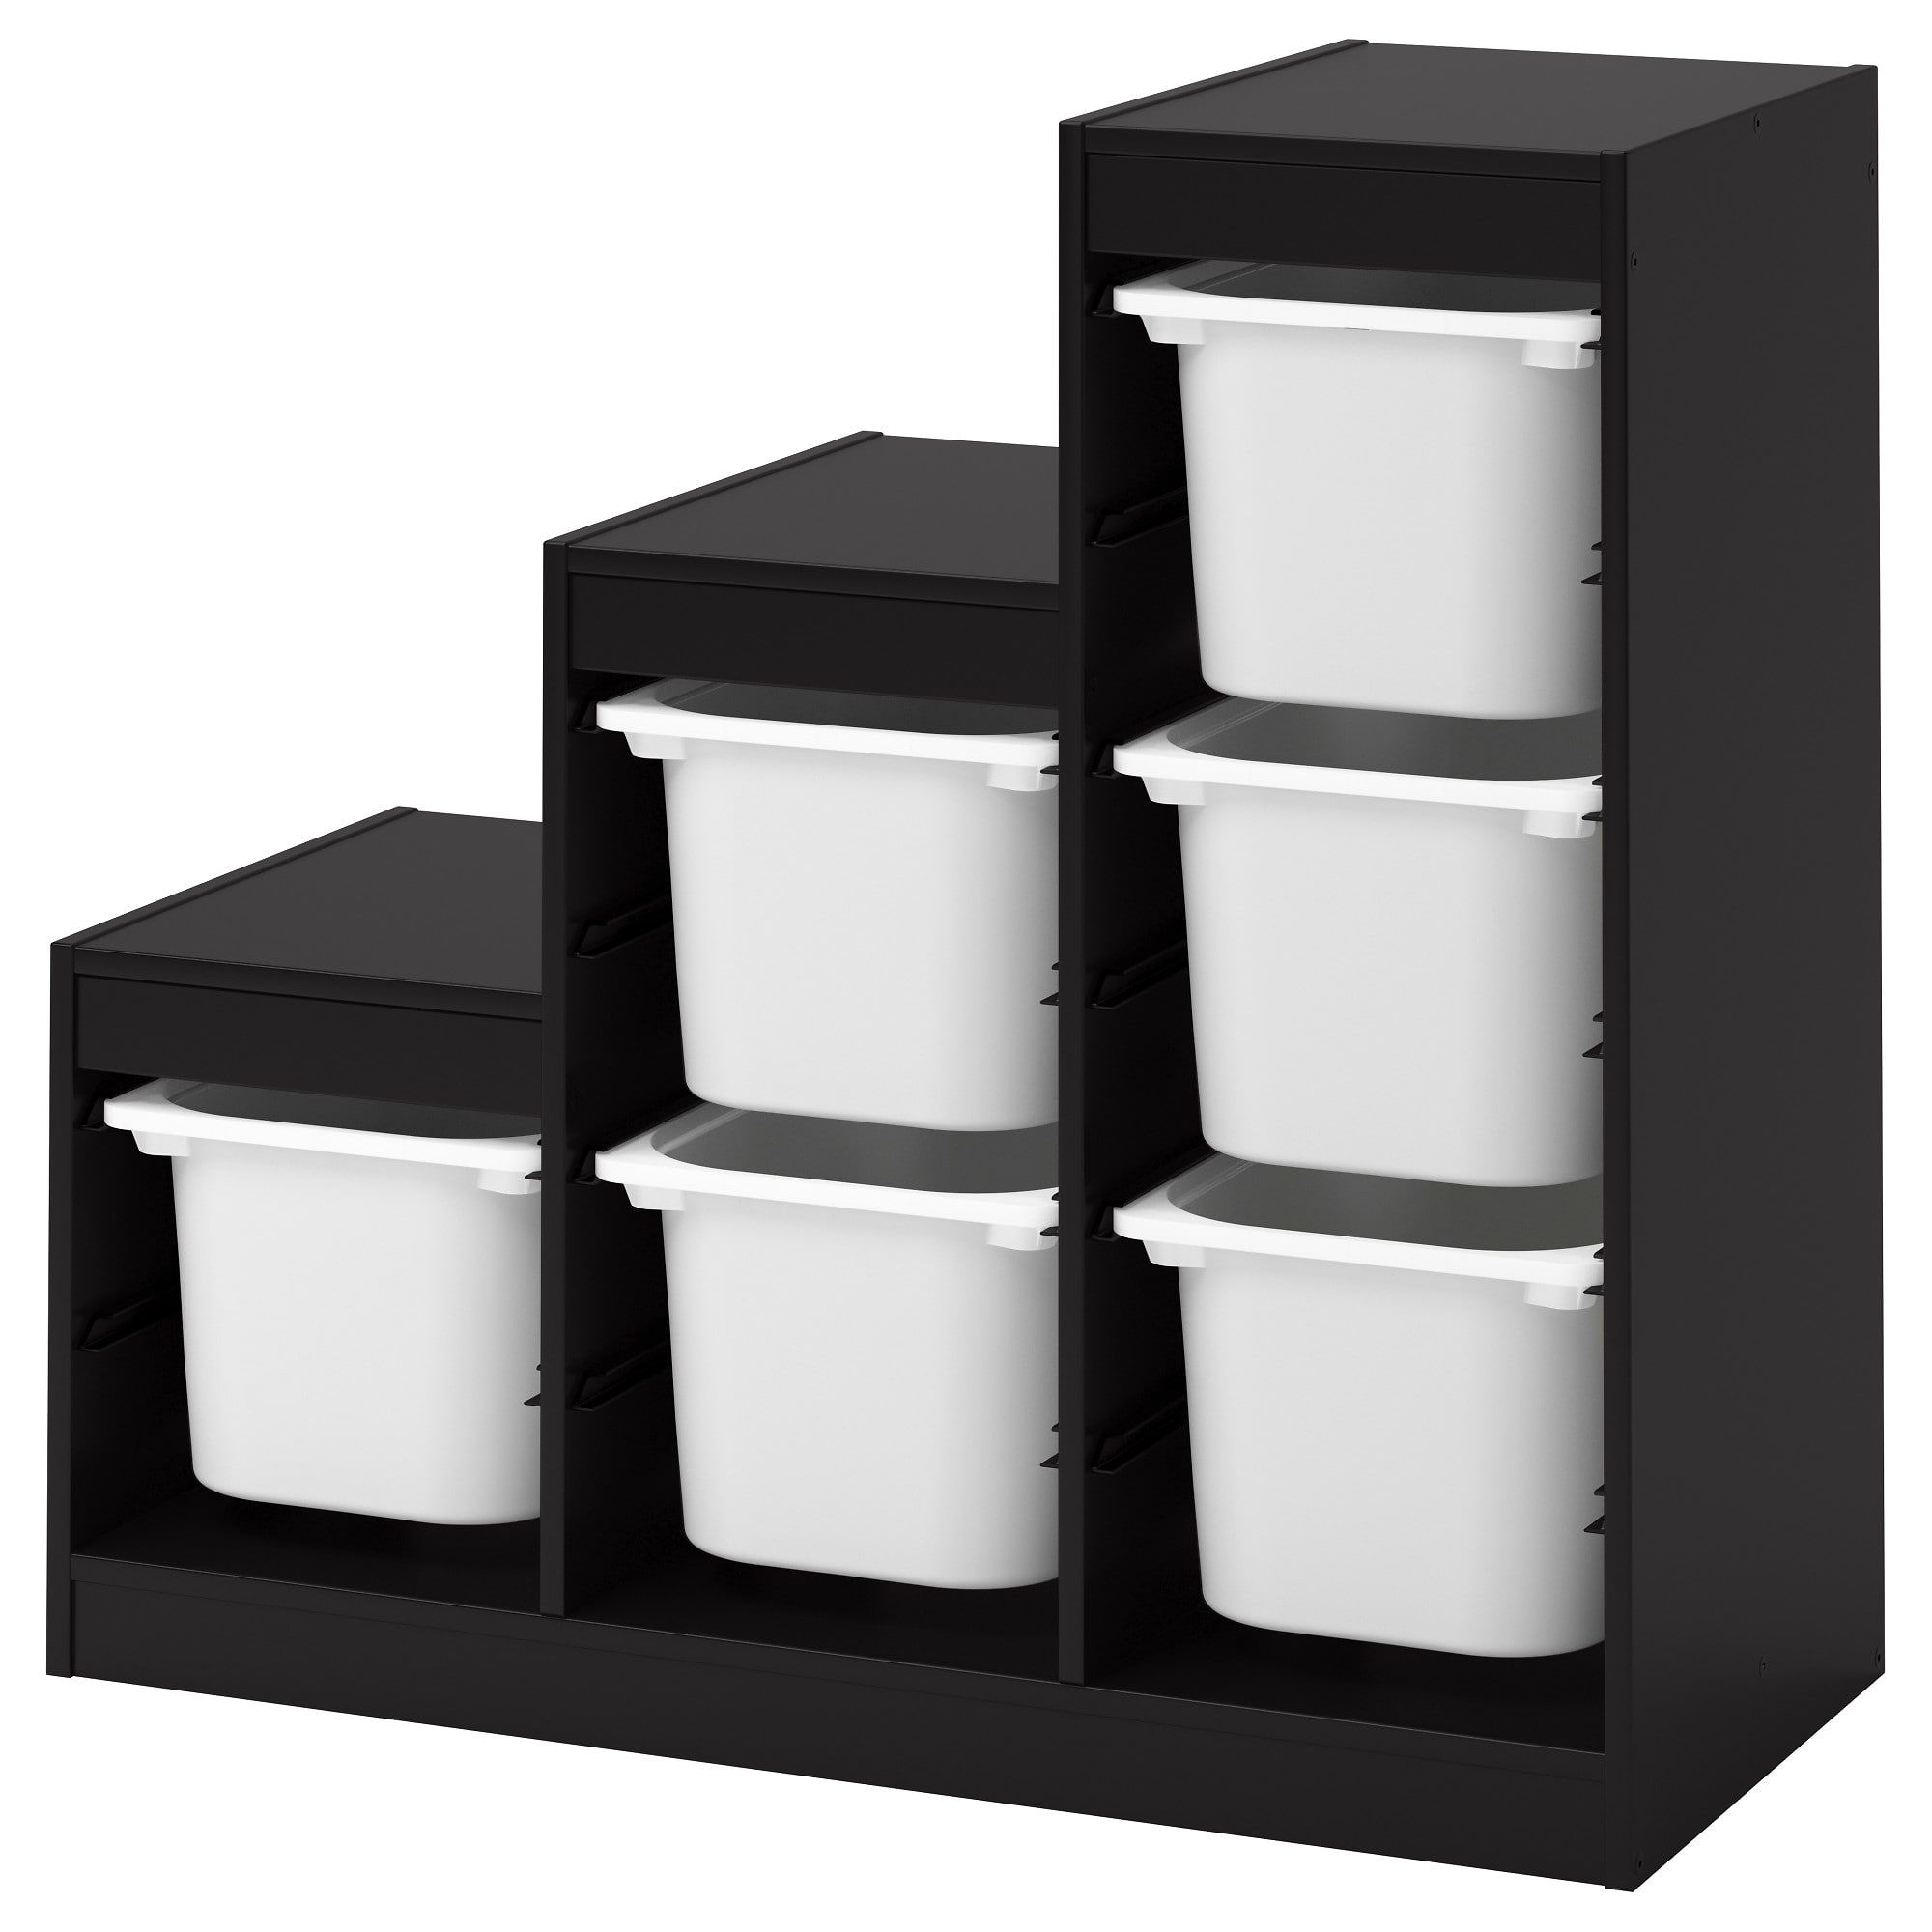 Trofast Storage Combination With Boxes Black White 39x17 3 8x37